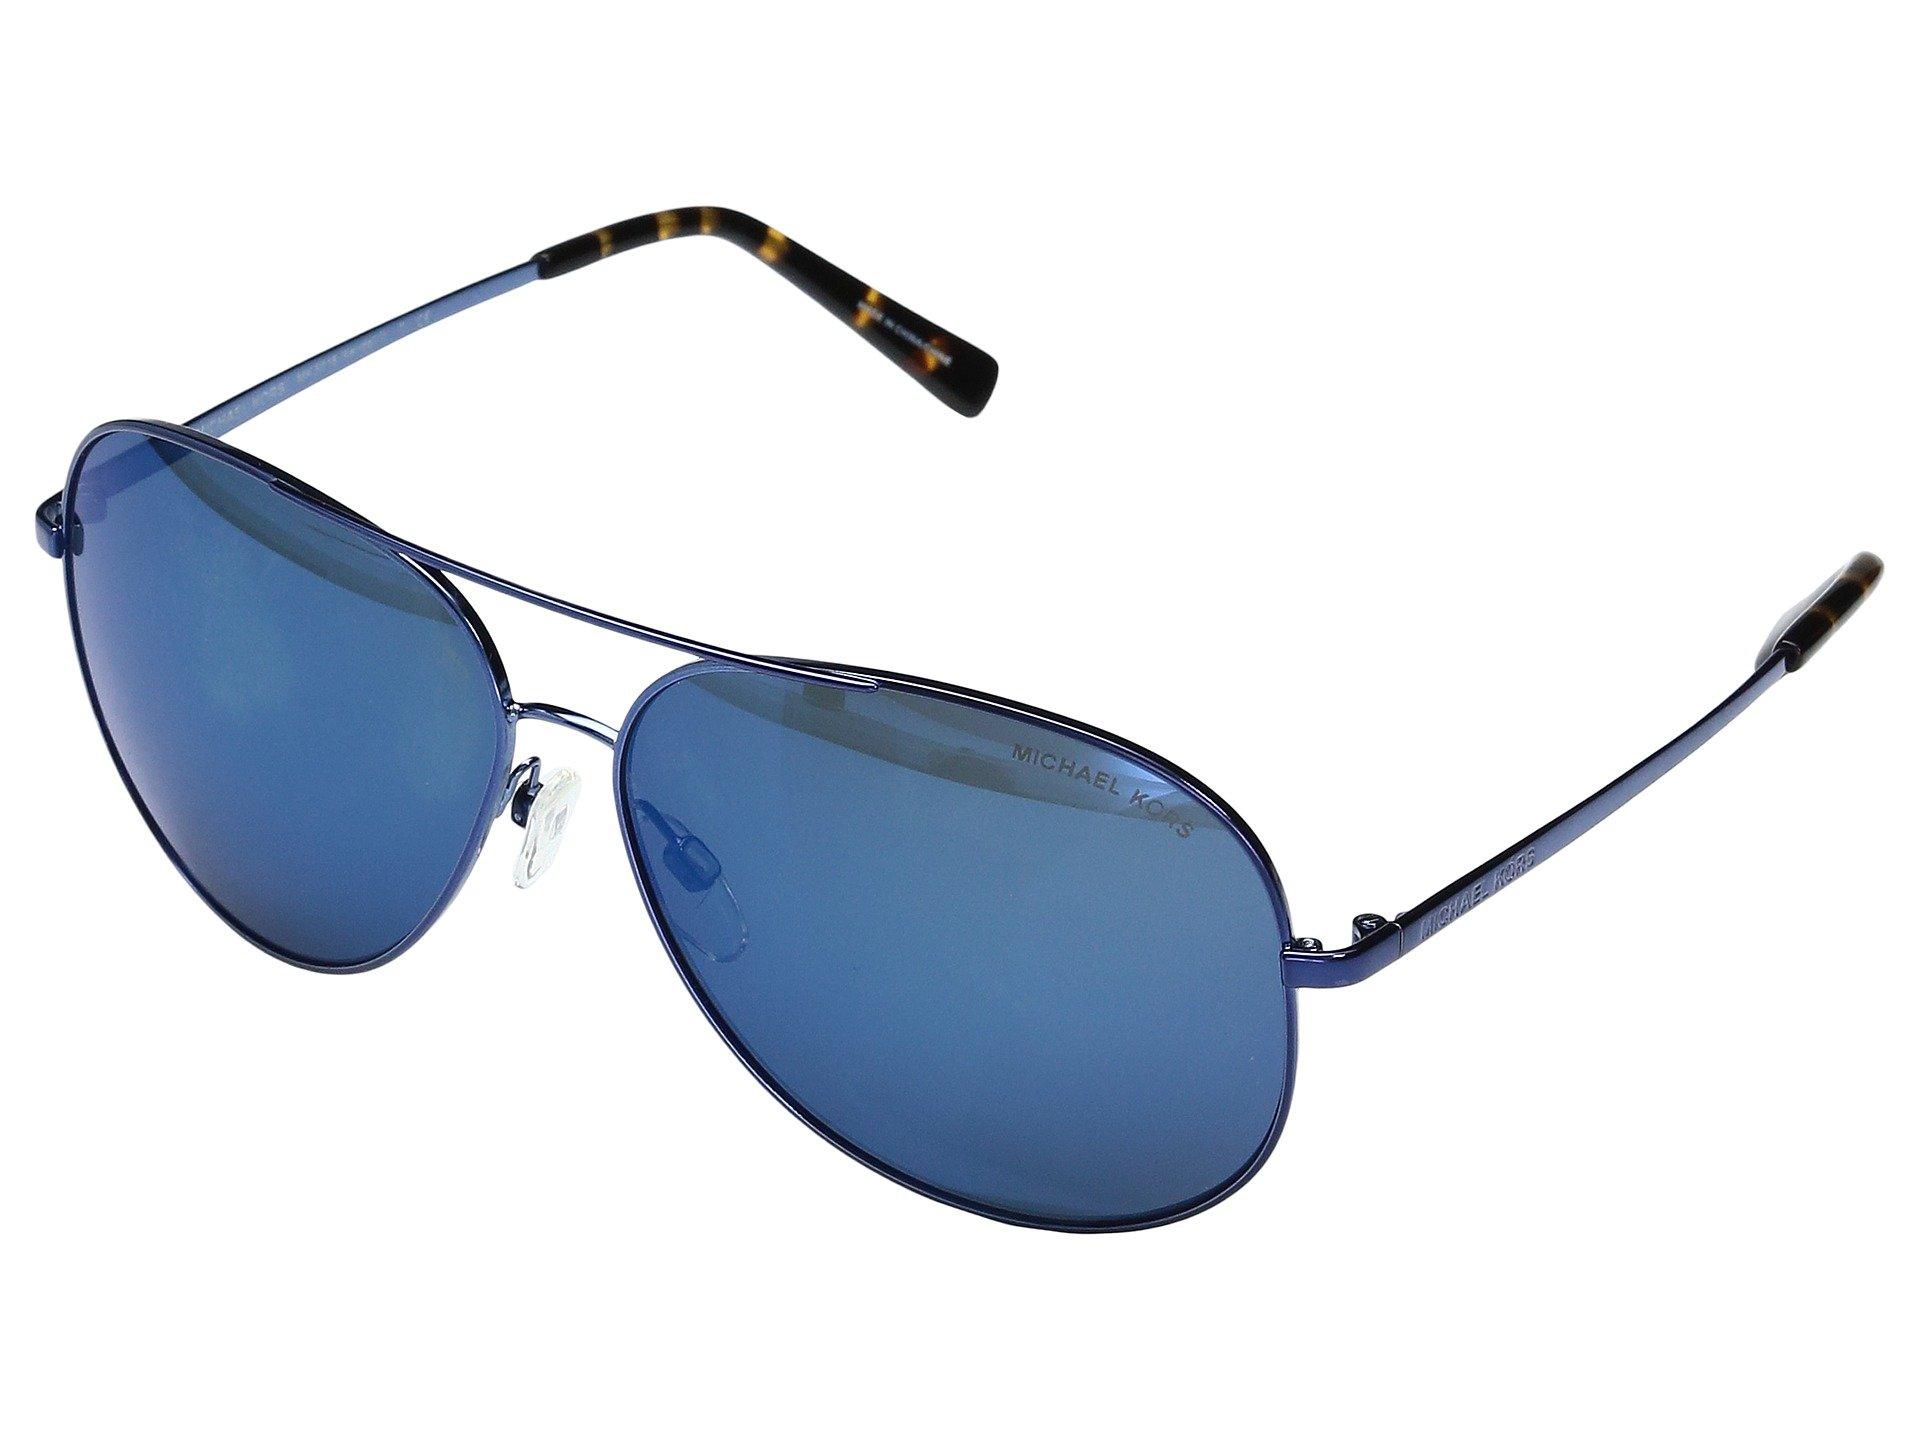 0cc25076f211c Michael Kors Kendall Mk5016 60Mm In Navy Dark Blue Mirror Blue ...